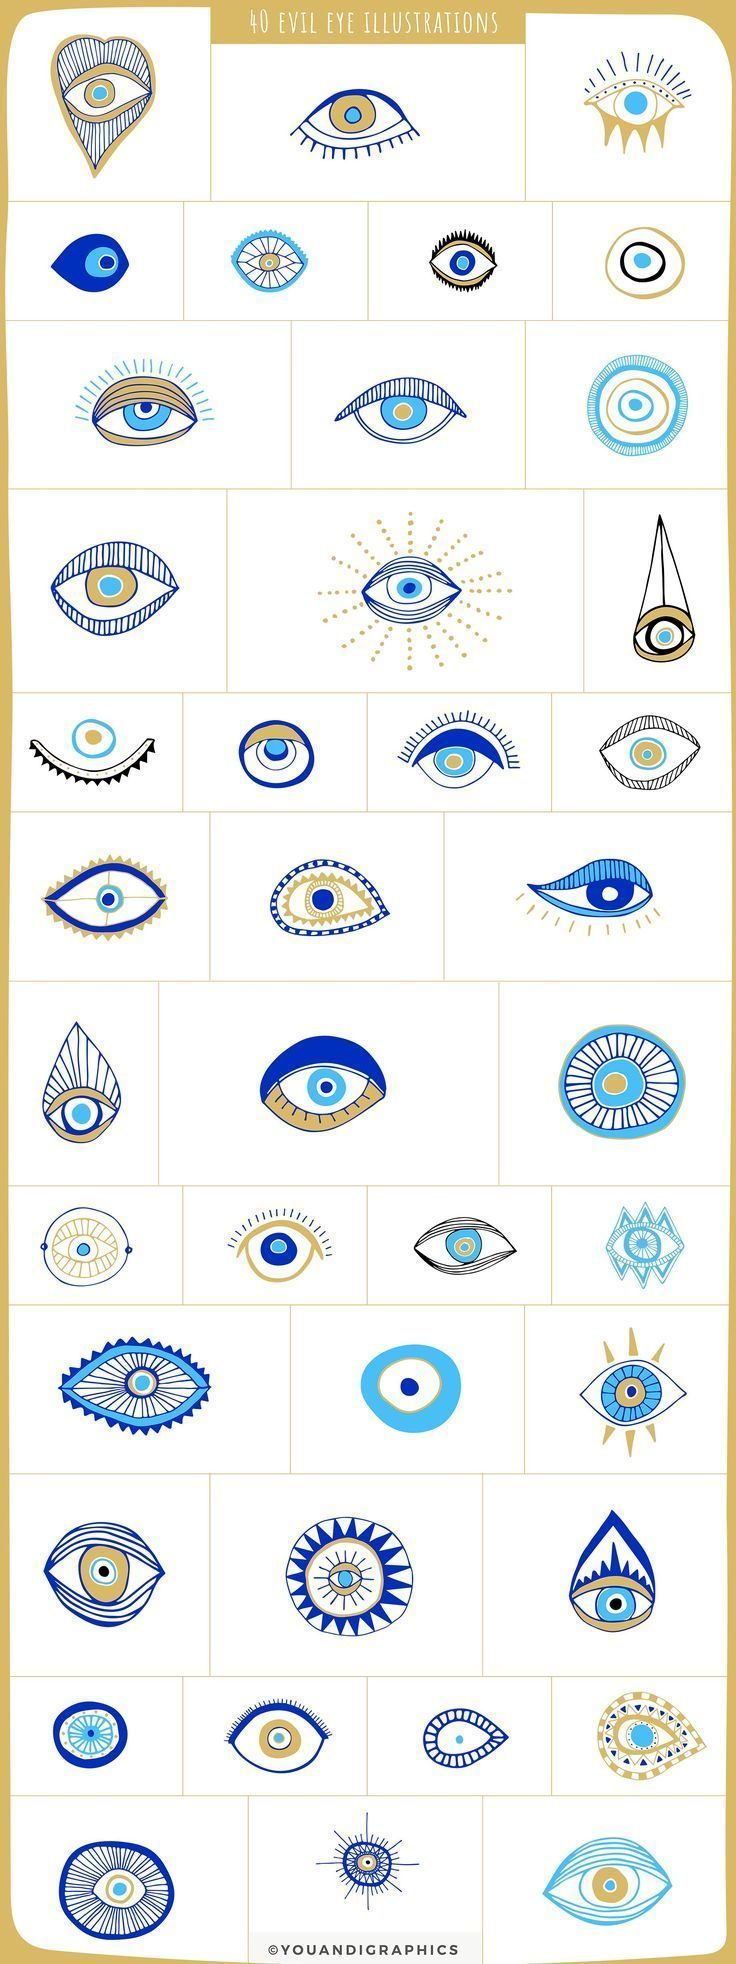 Evil Eye Illustrations  Patterns by Youandigraphics on Creative Market  Evil Eye Illustrations  Patterns by Youandigraphics on Creative Market